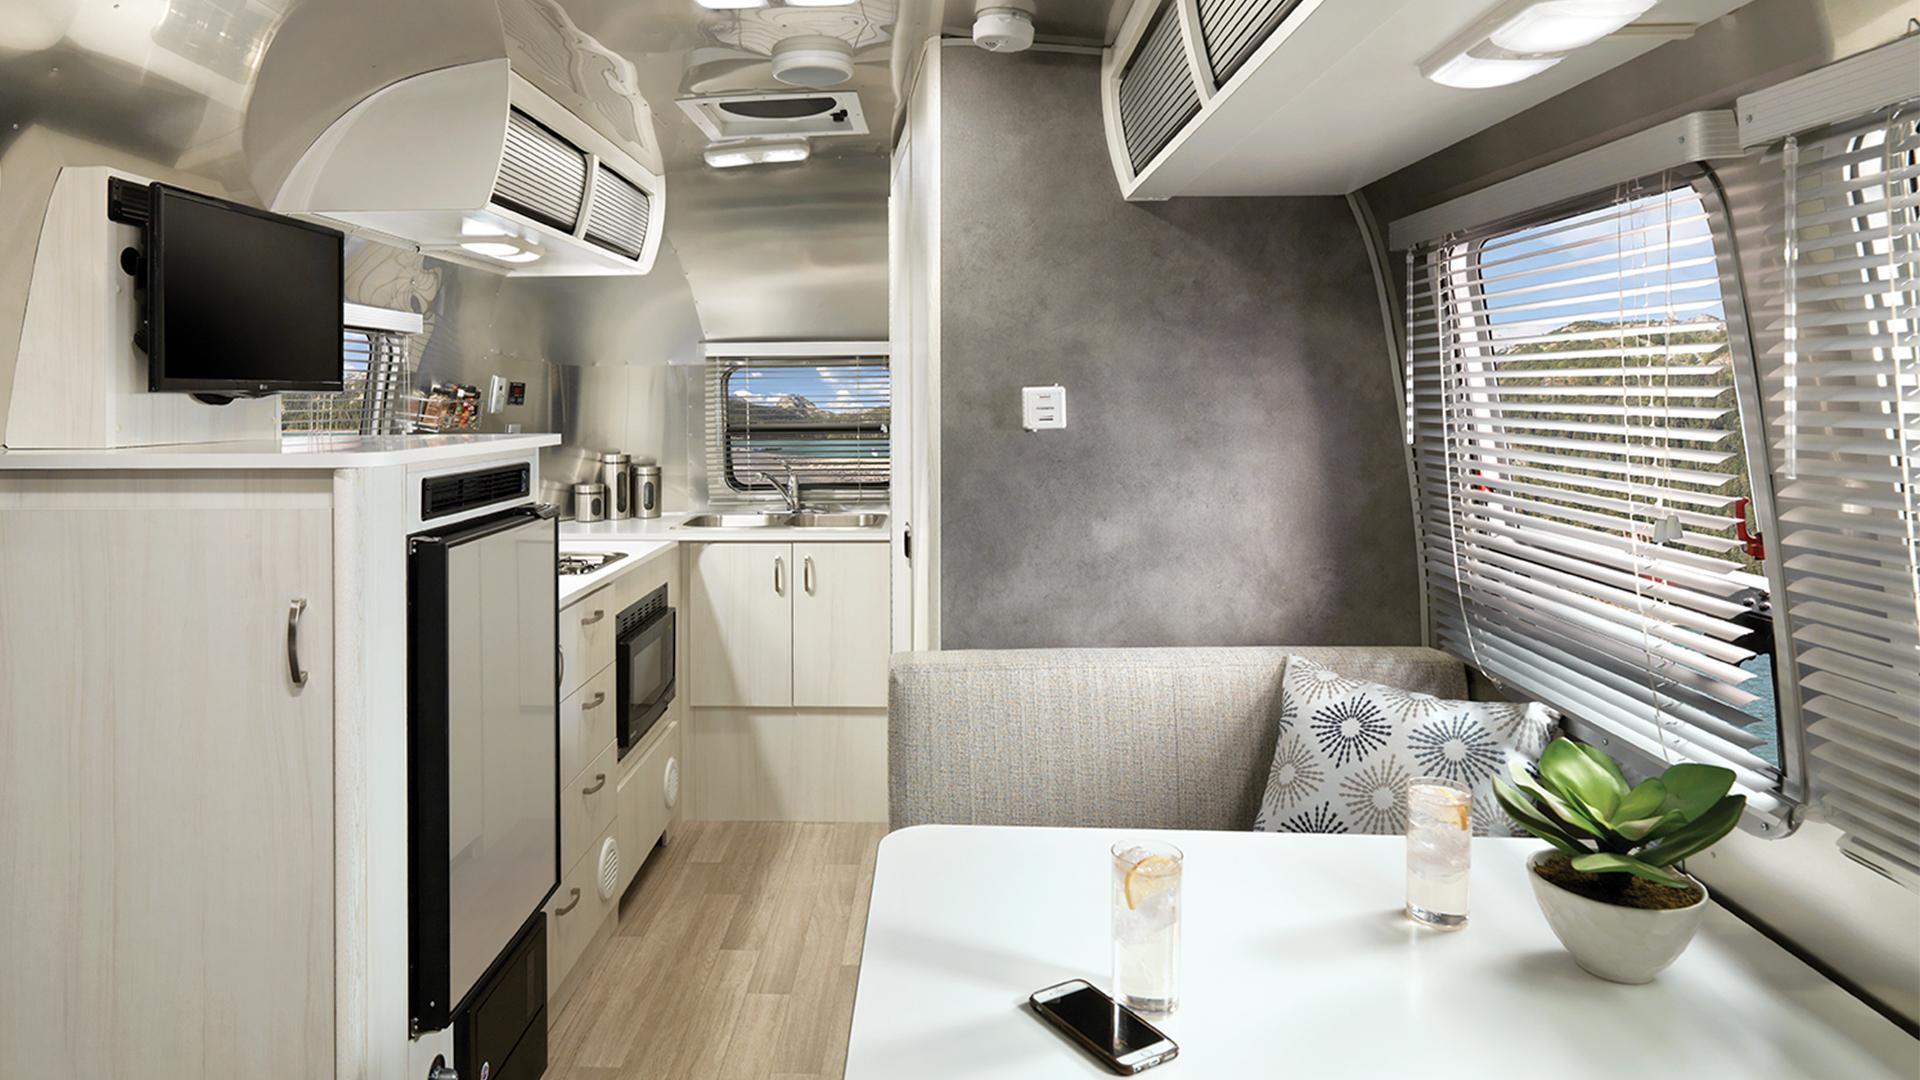 2021-Airstream-Bambi-20FB-Dune-Interior